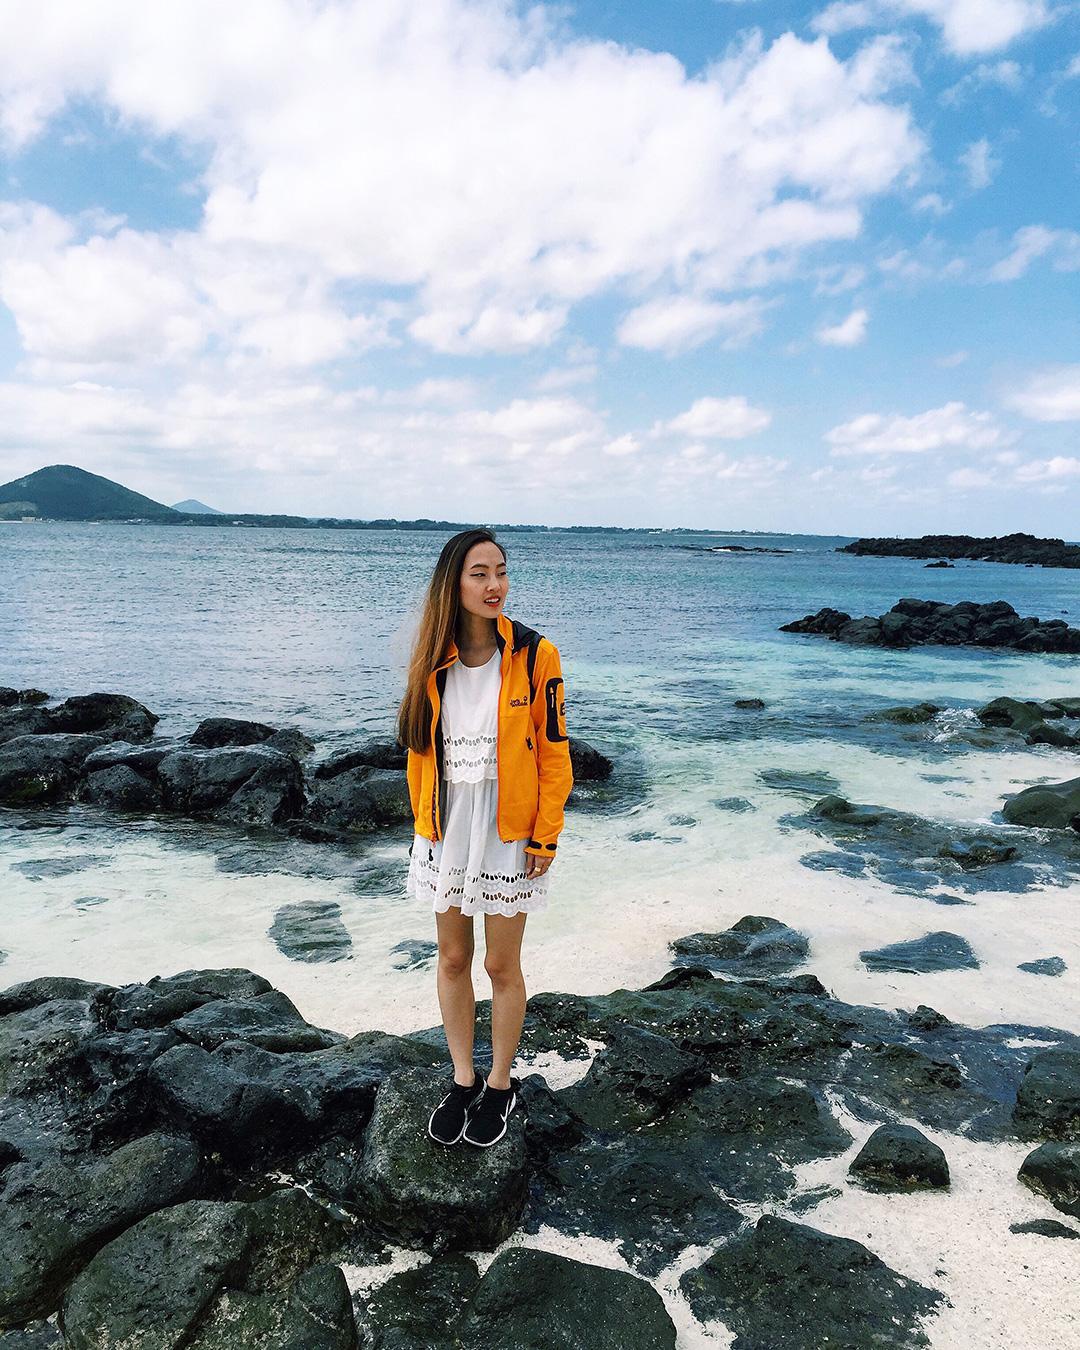 Enjoying the beautiful Seobinbaeksa Beach with its contrasting black lava rocks and white coral sands.